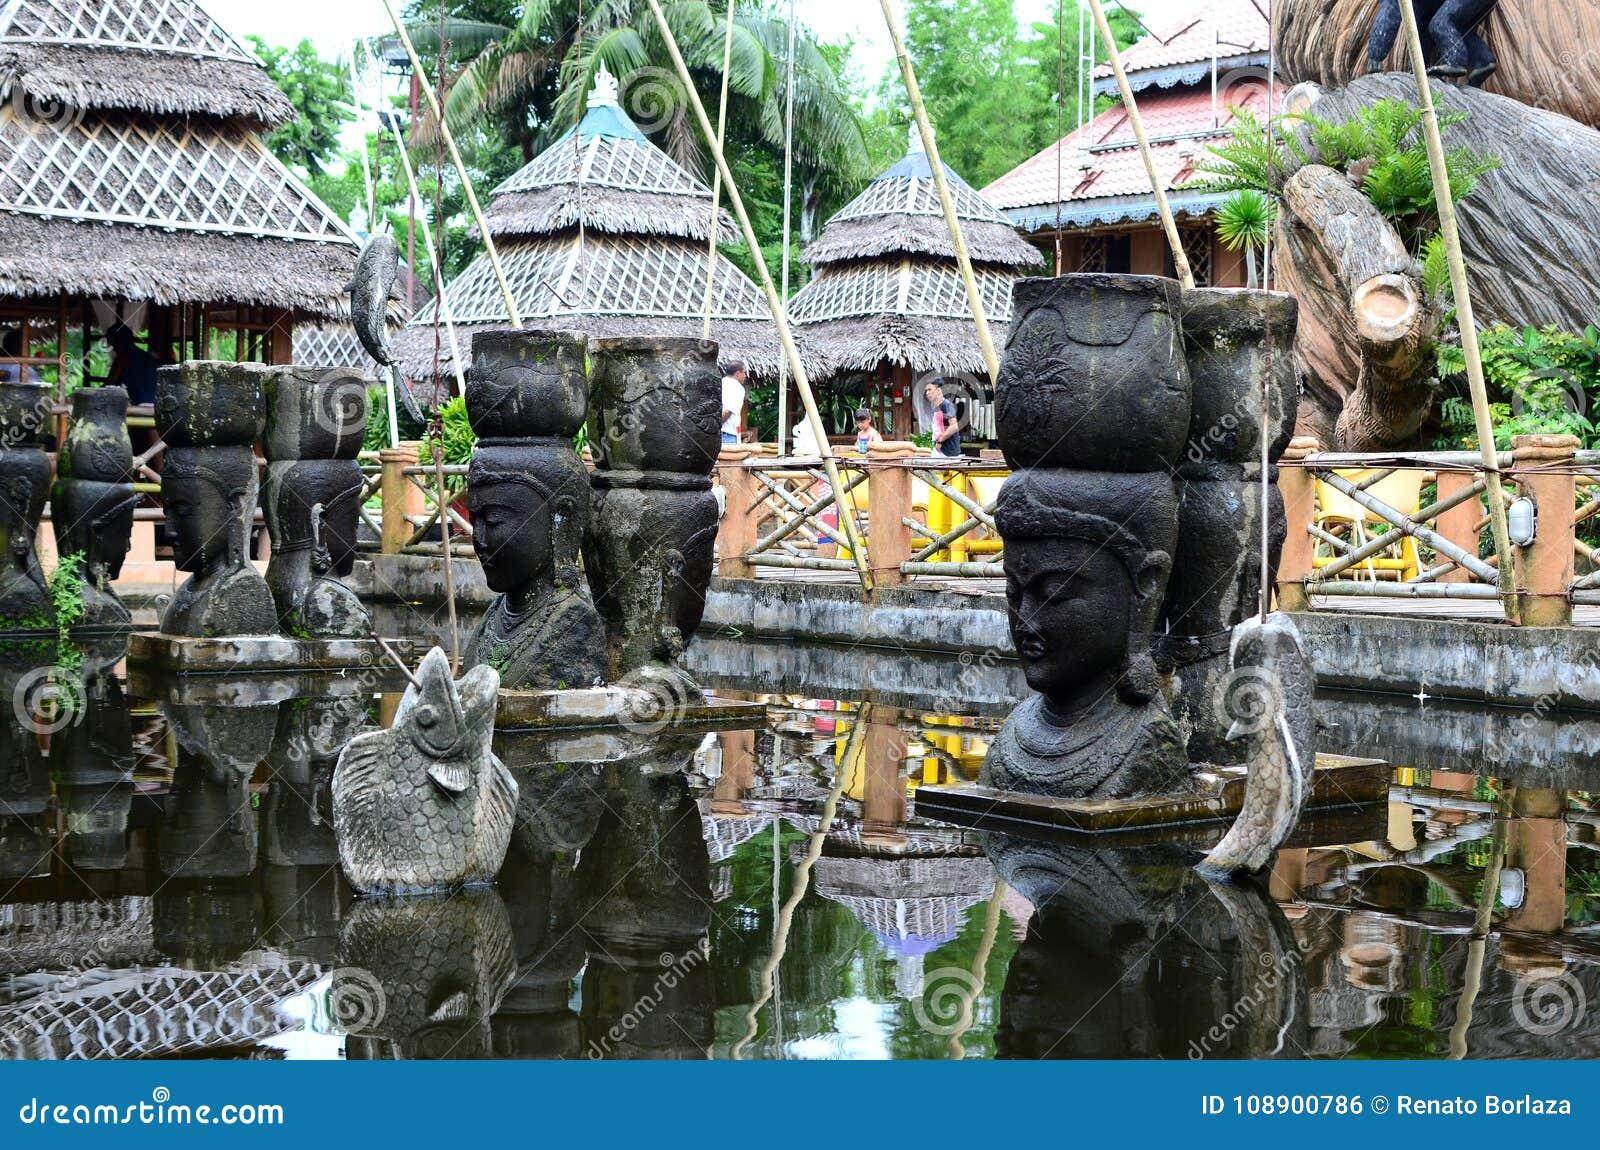 Giant stone buddha decorates an Asian aquatic jungle theme park